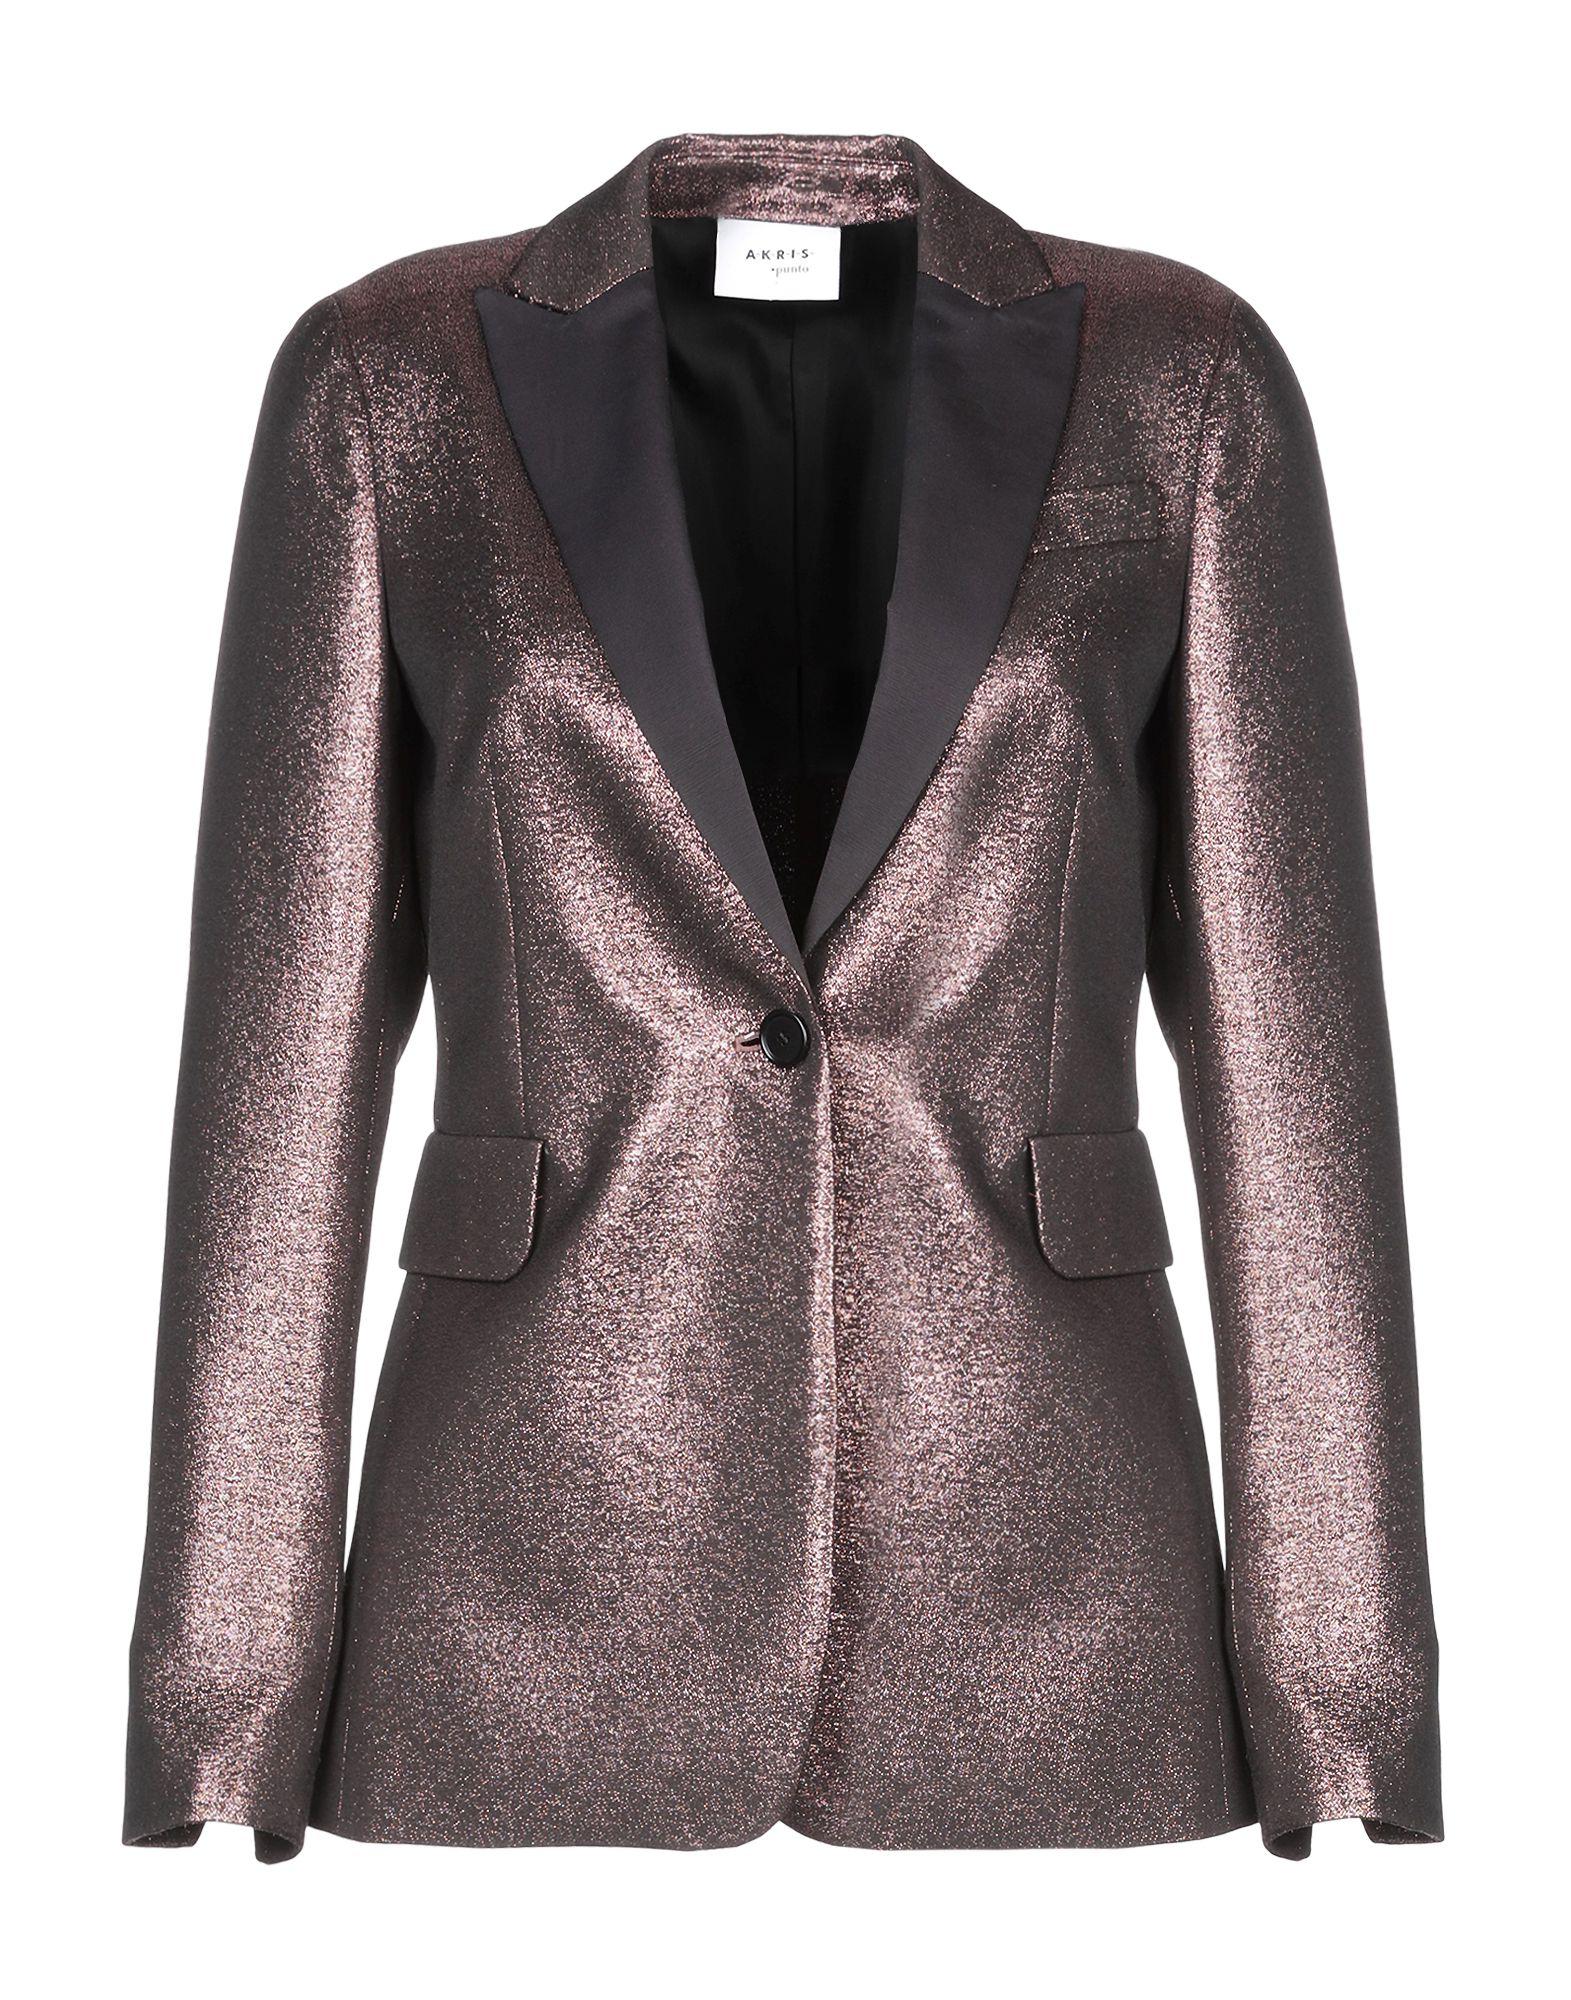 AKRIS PUNTO Suit jackets. plain weave, lamé, no appliqués, basic solid colour, lapel collar, single-breasted, button closing, no pockets, long sleeves, semi-lined, rear slit. 51% Cotton, 49% Polyester